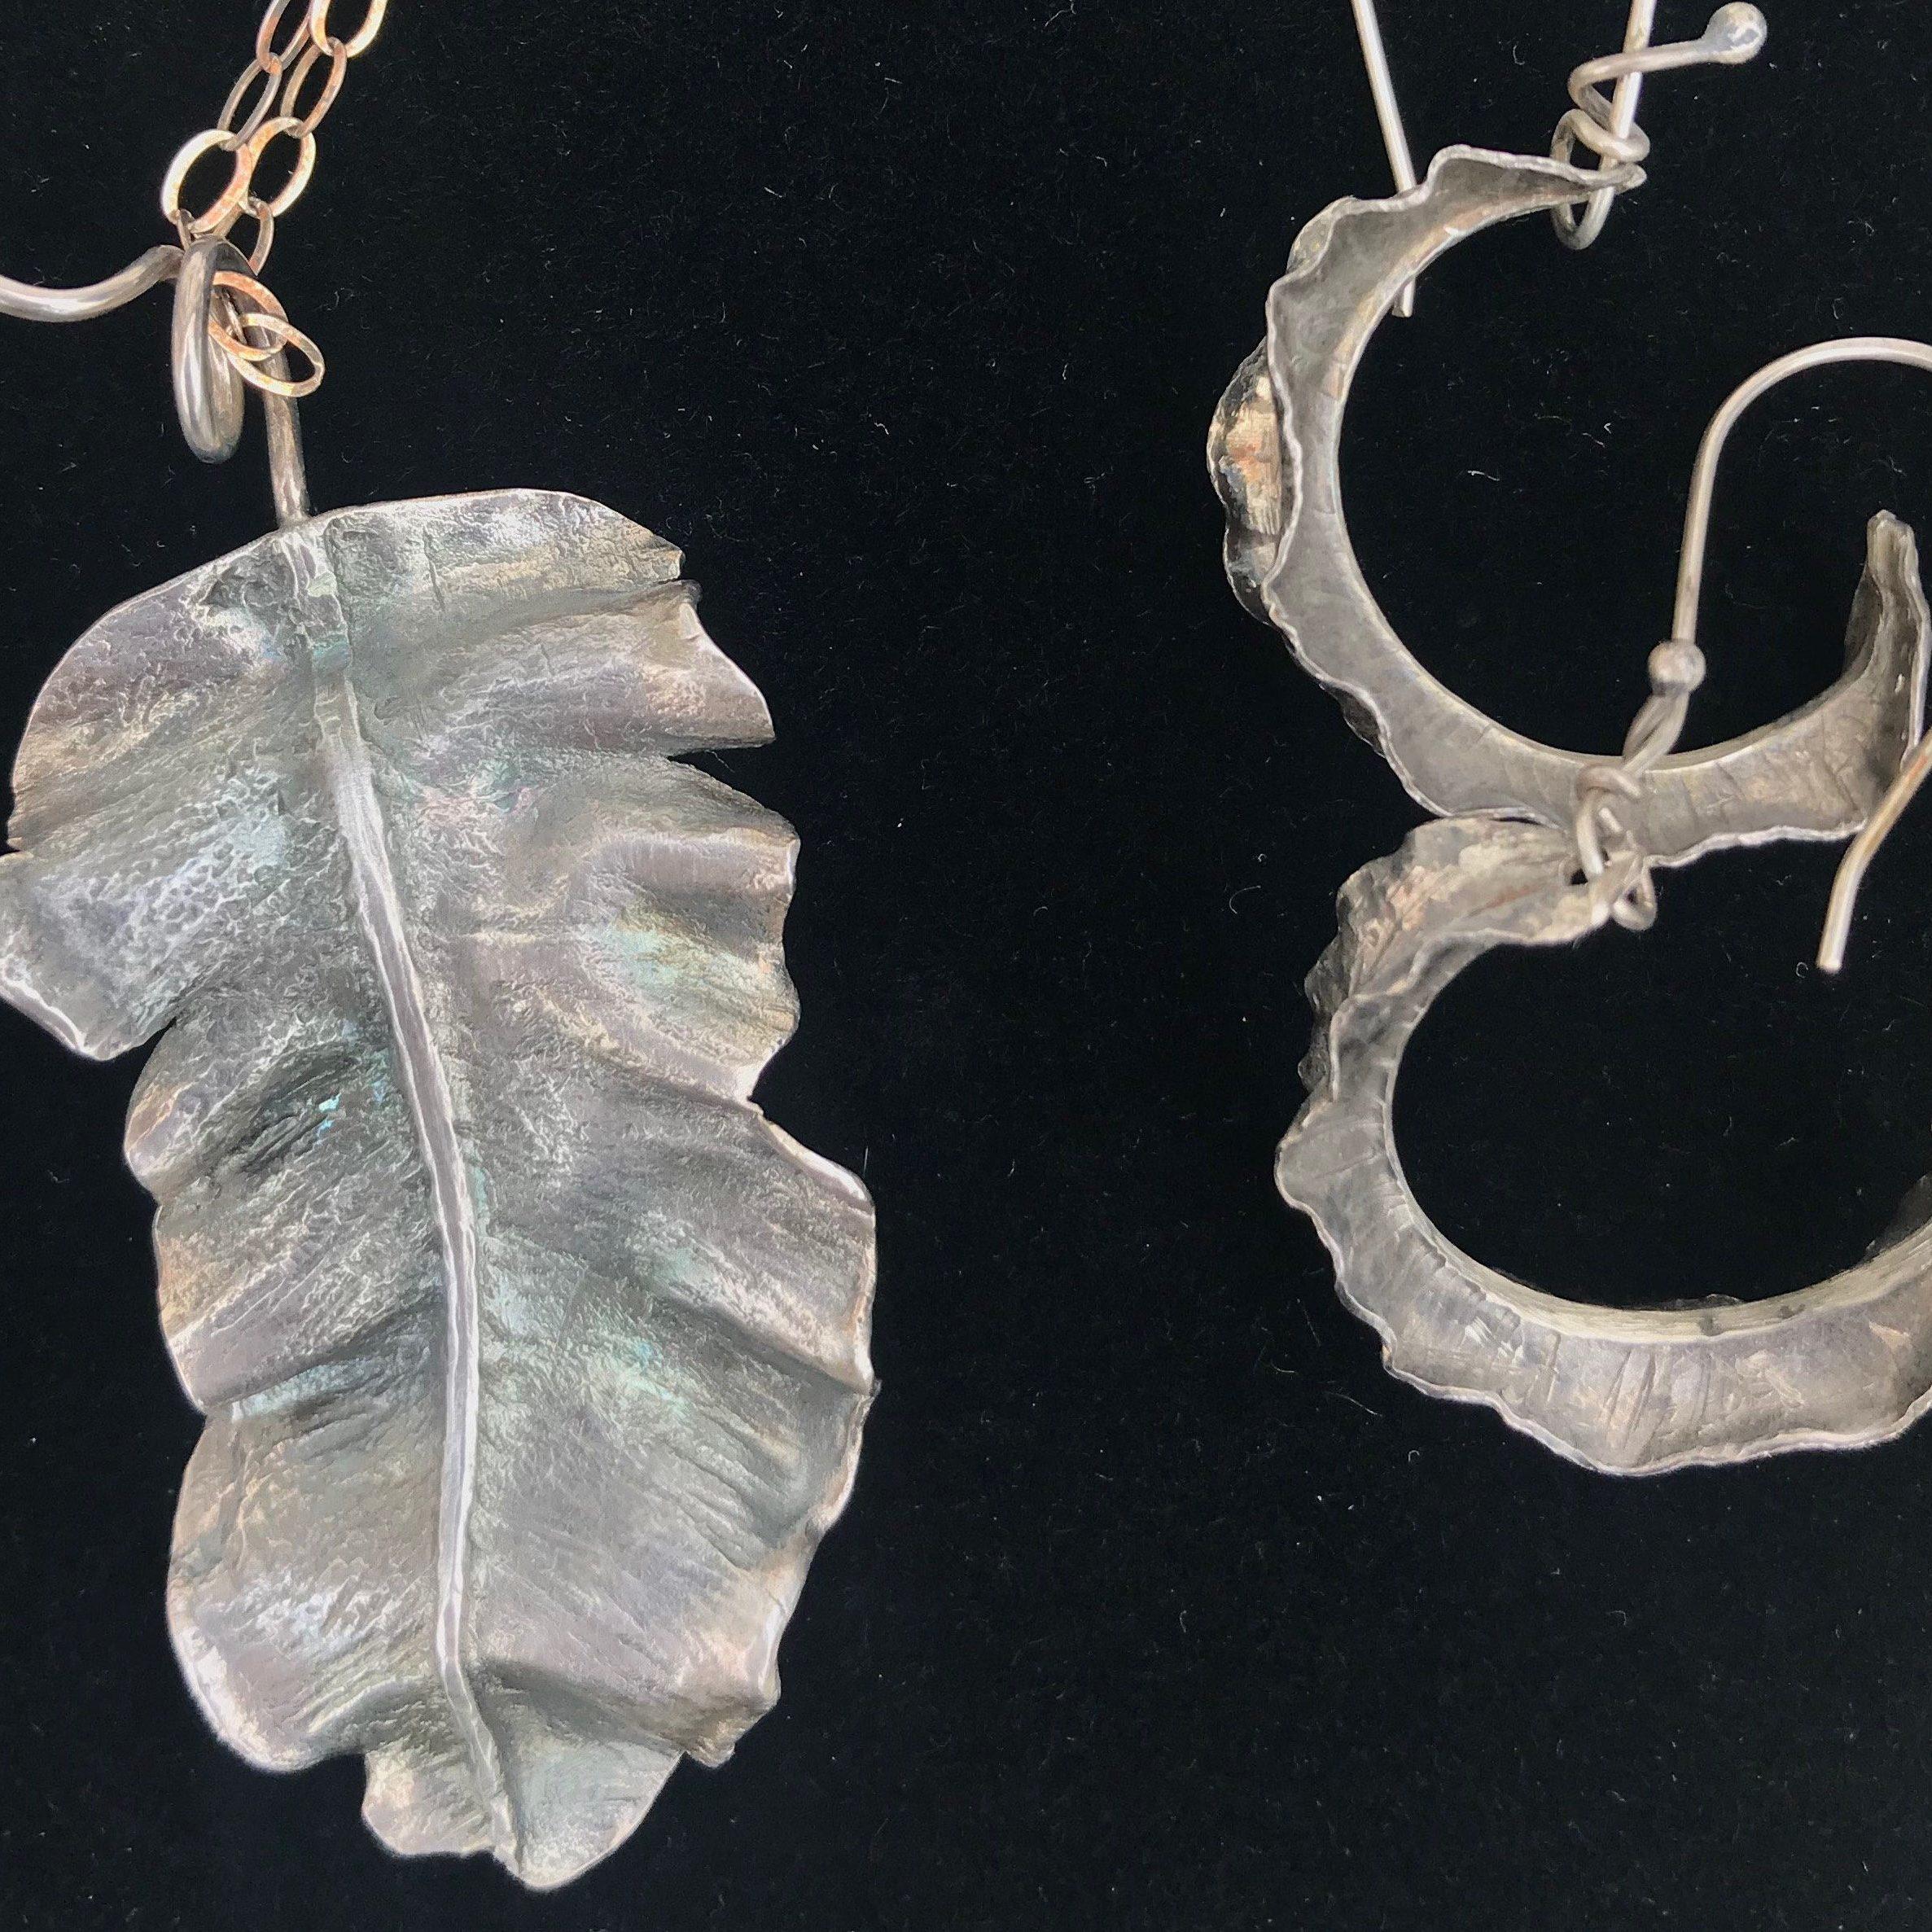 leaf pendant and earrings Dina LaMontagne August 2018 Art Market